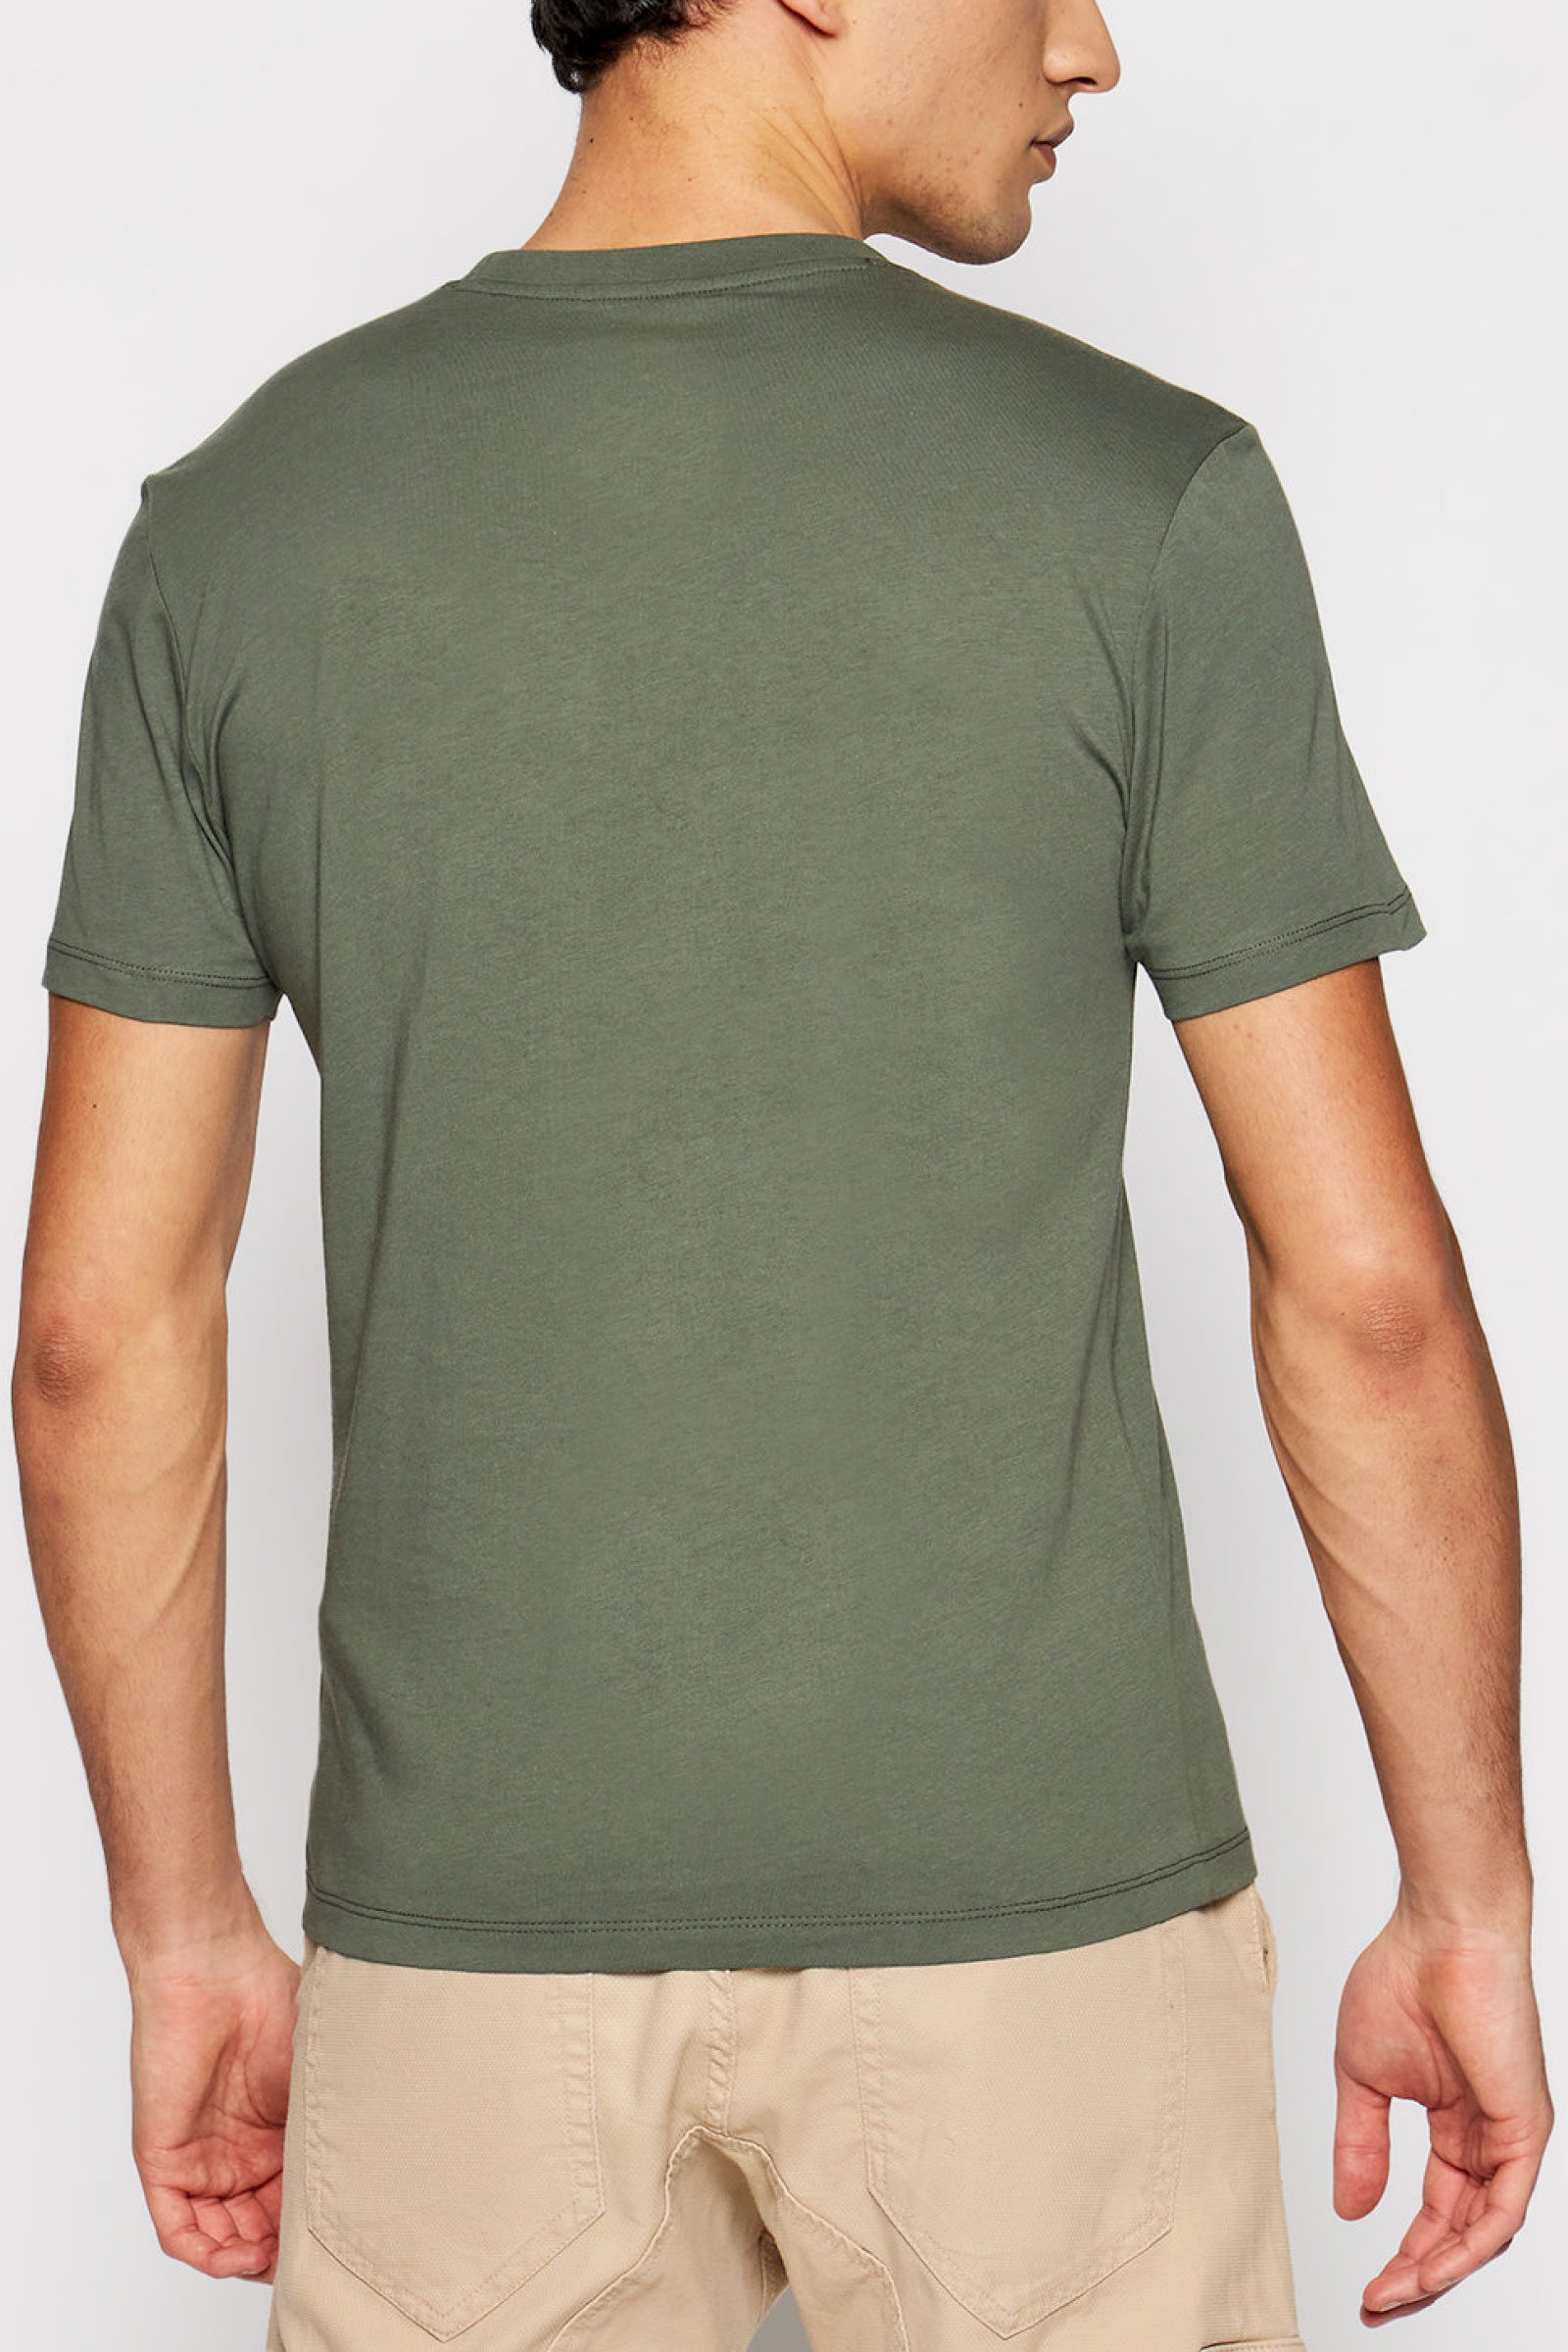 BLAUER Men's T-Shirt BLAUER | T-Shirt | 21SBLUH02128702